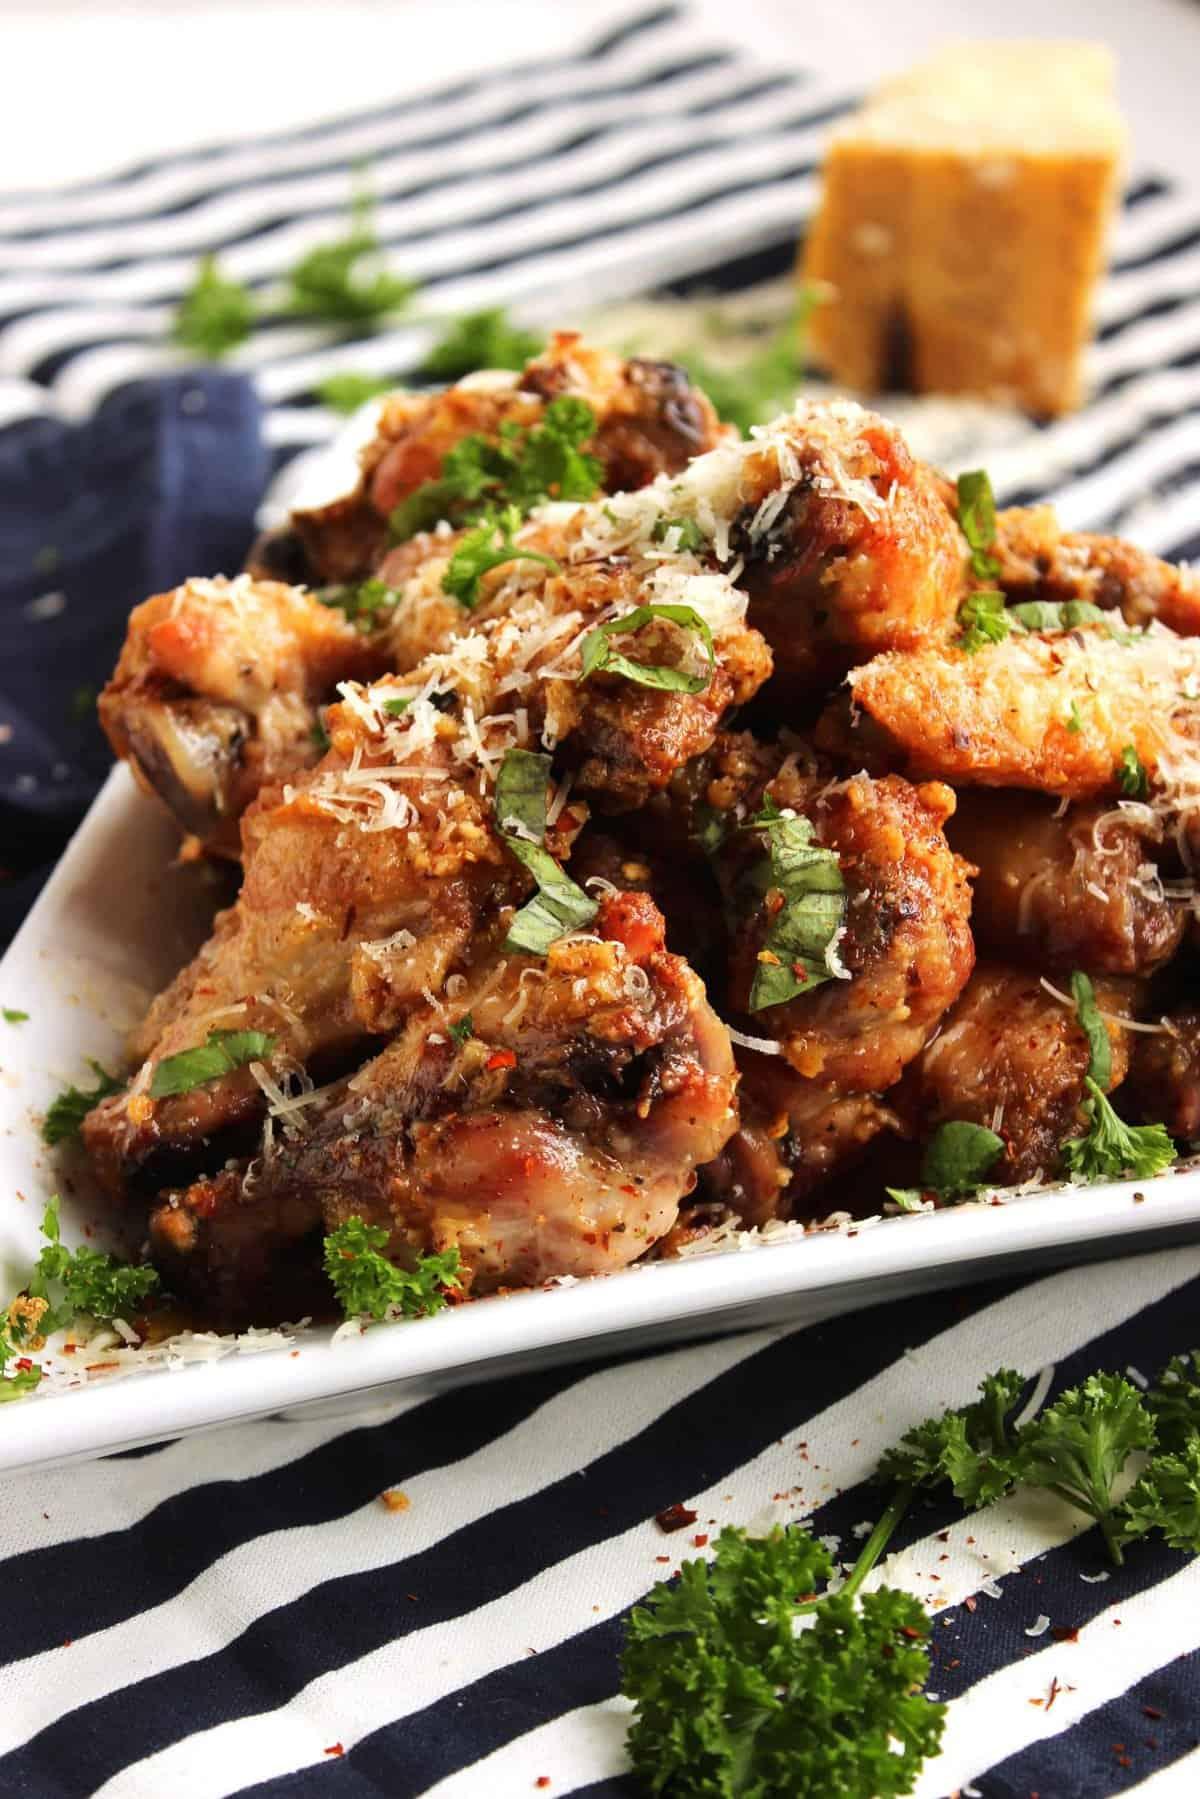 Baked Garlic Parmesan Wings | The Suburban Soapbox